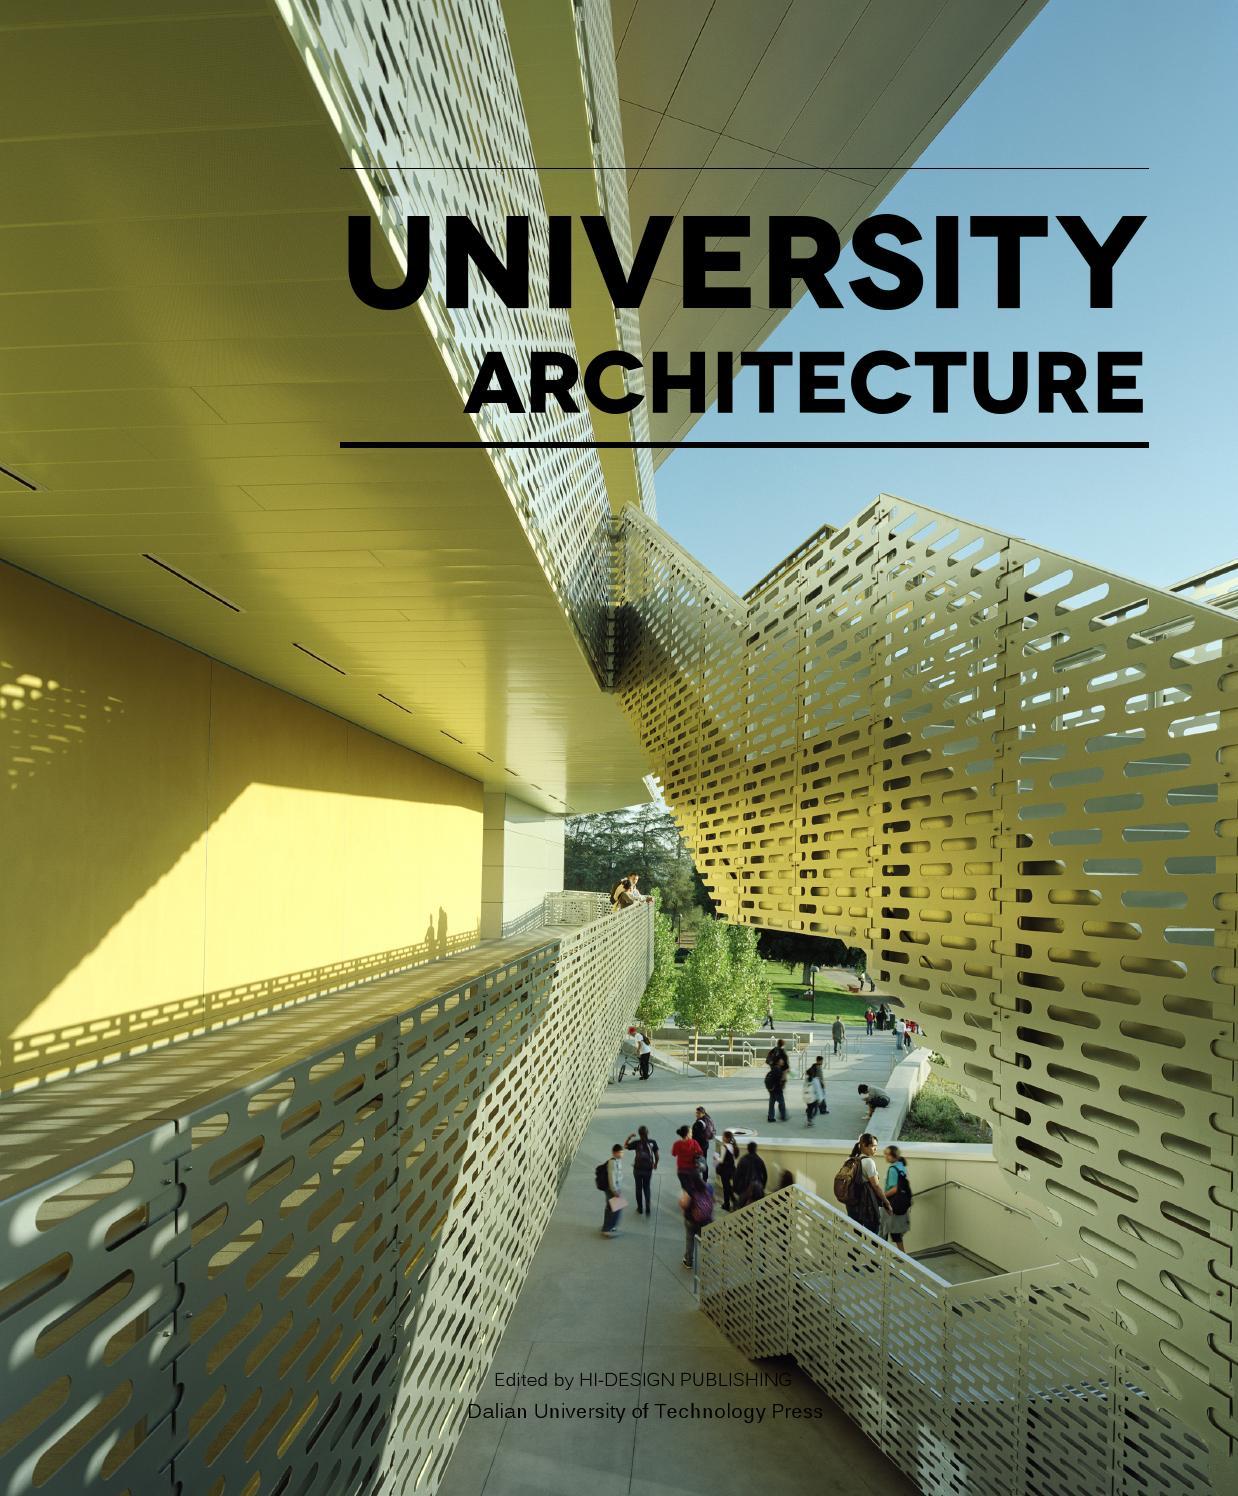 University Architecture by HI-DESIGN INTERNATIONAL